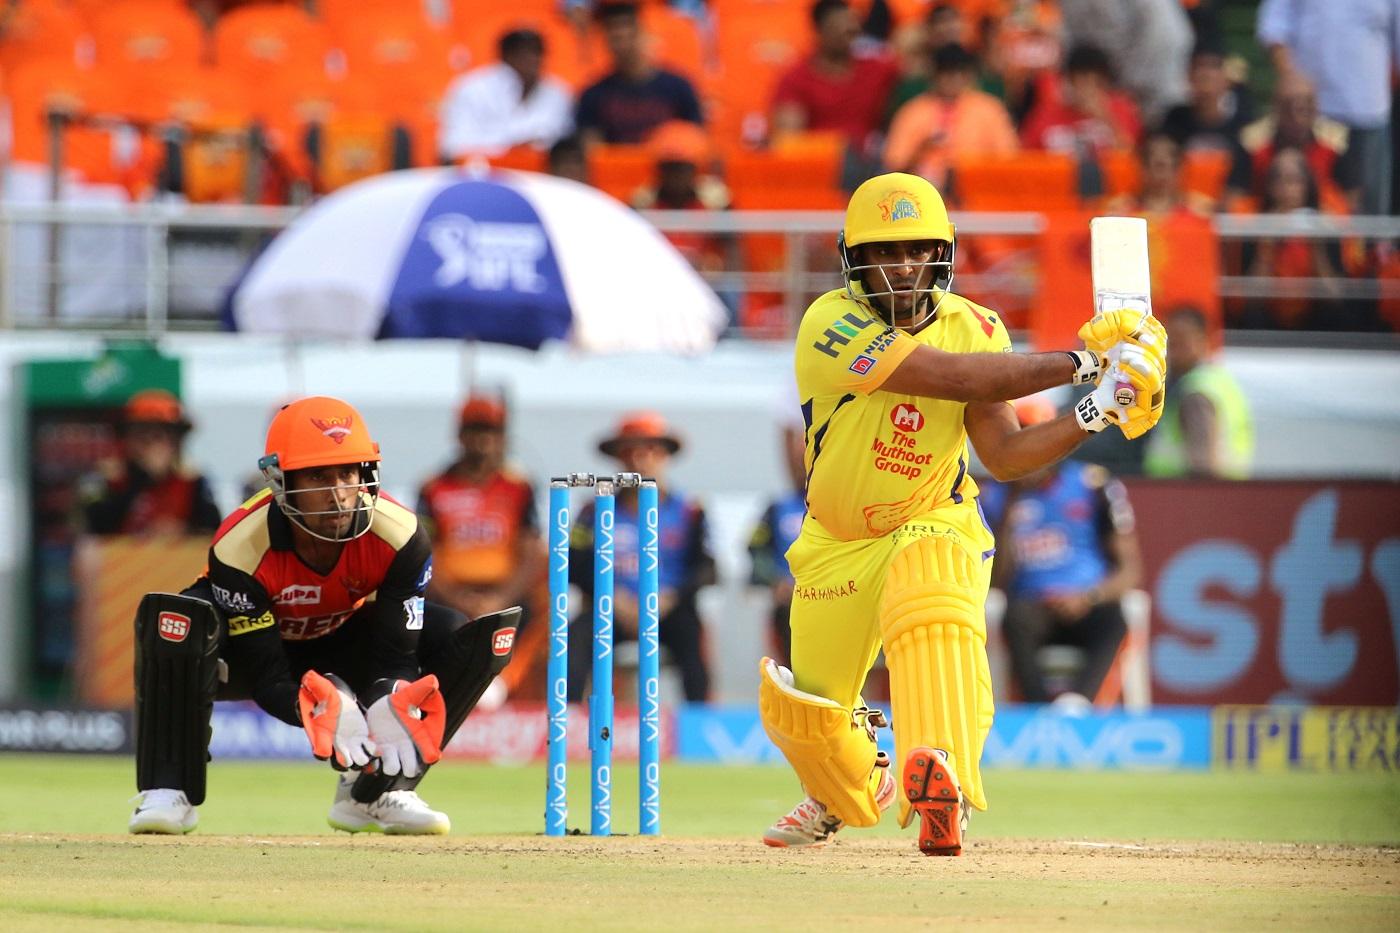 SRH vs CSK IPL 2018 MATCH No 20